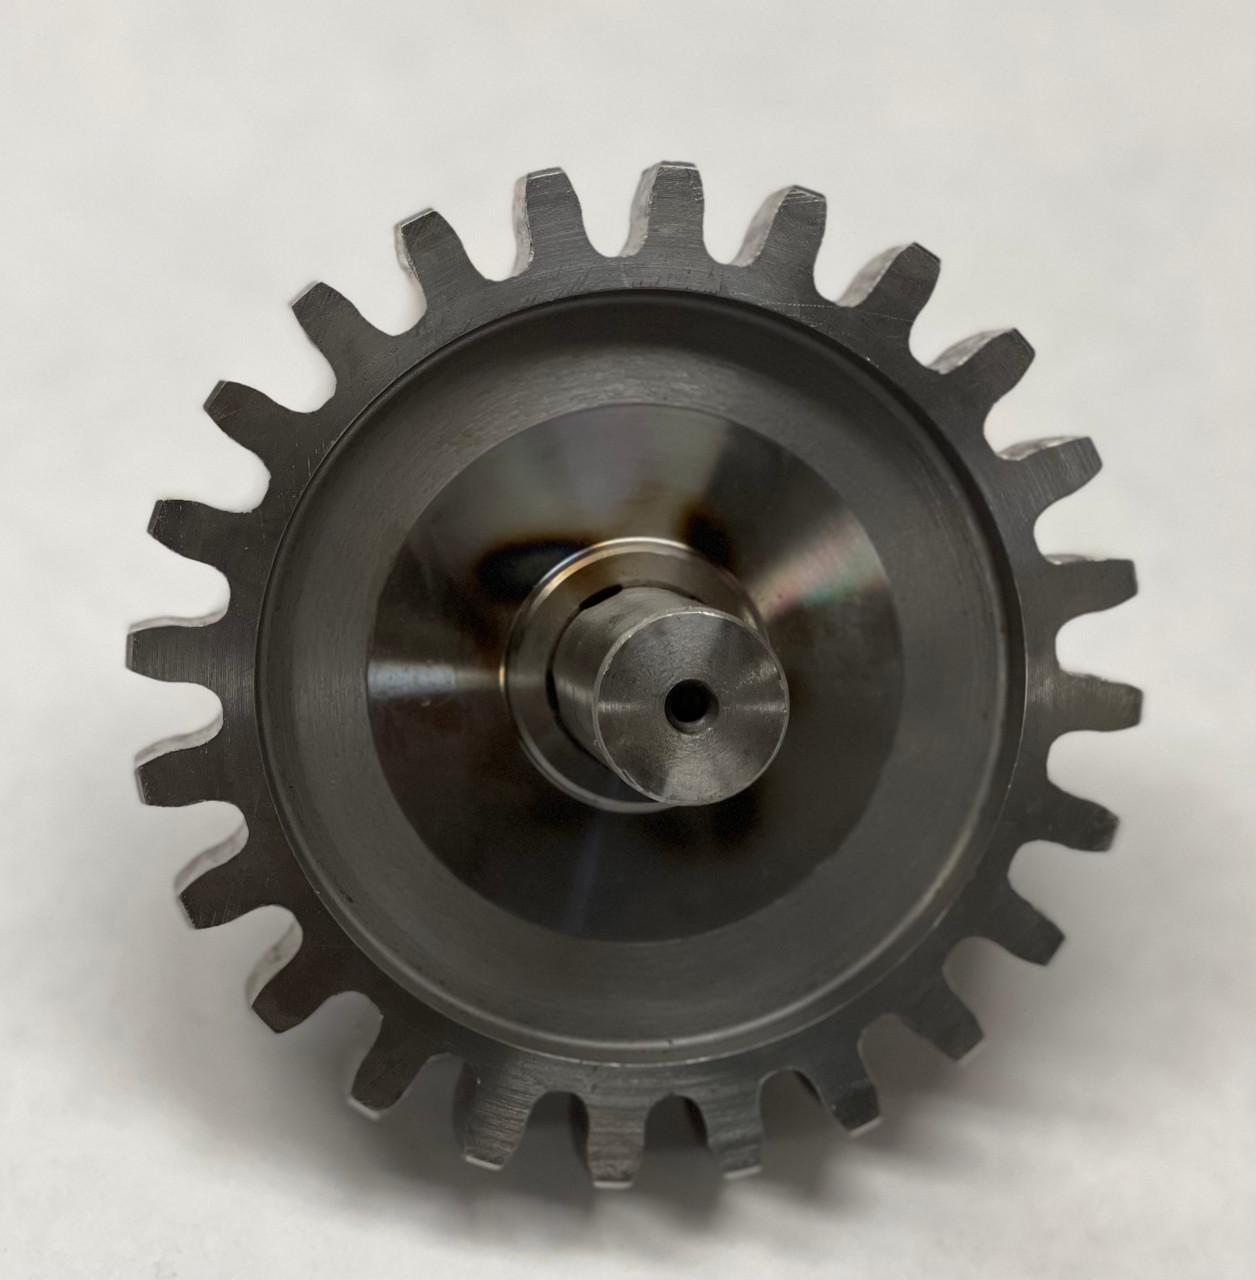 "Sausage Maker - 4 7/8"" Diameter Gear for 25lb Sausage Stuffer"